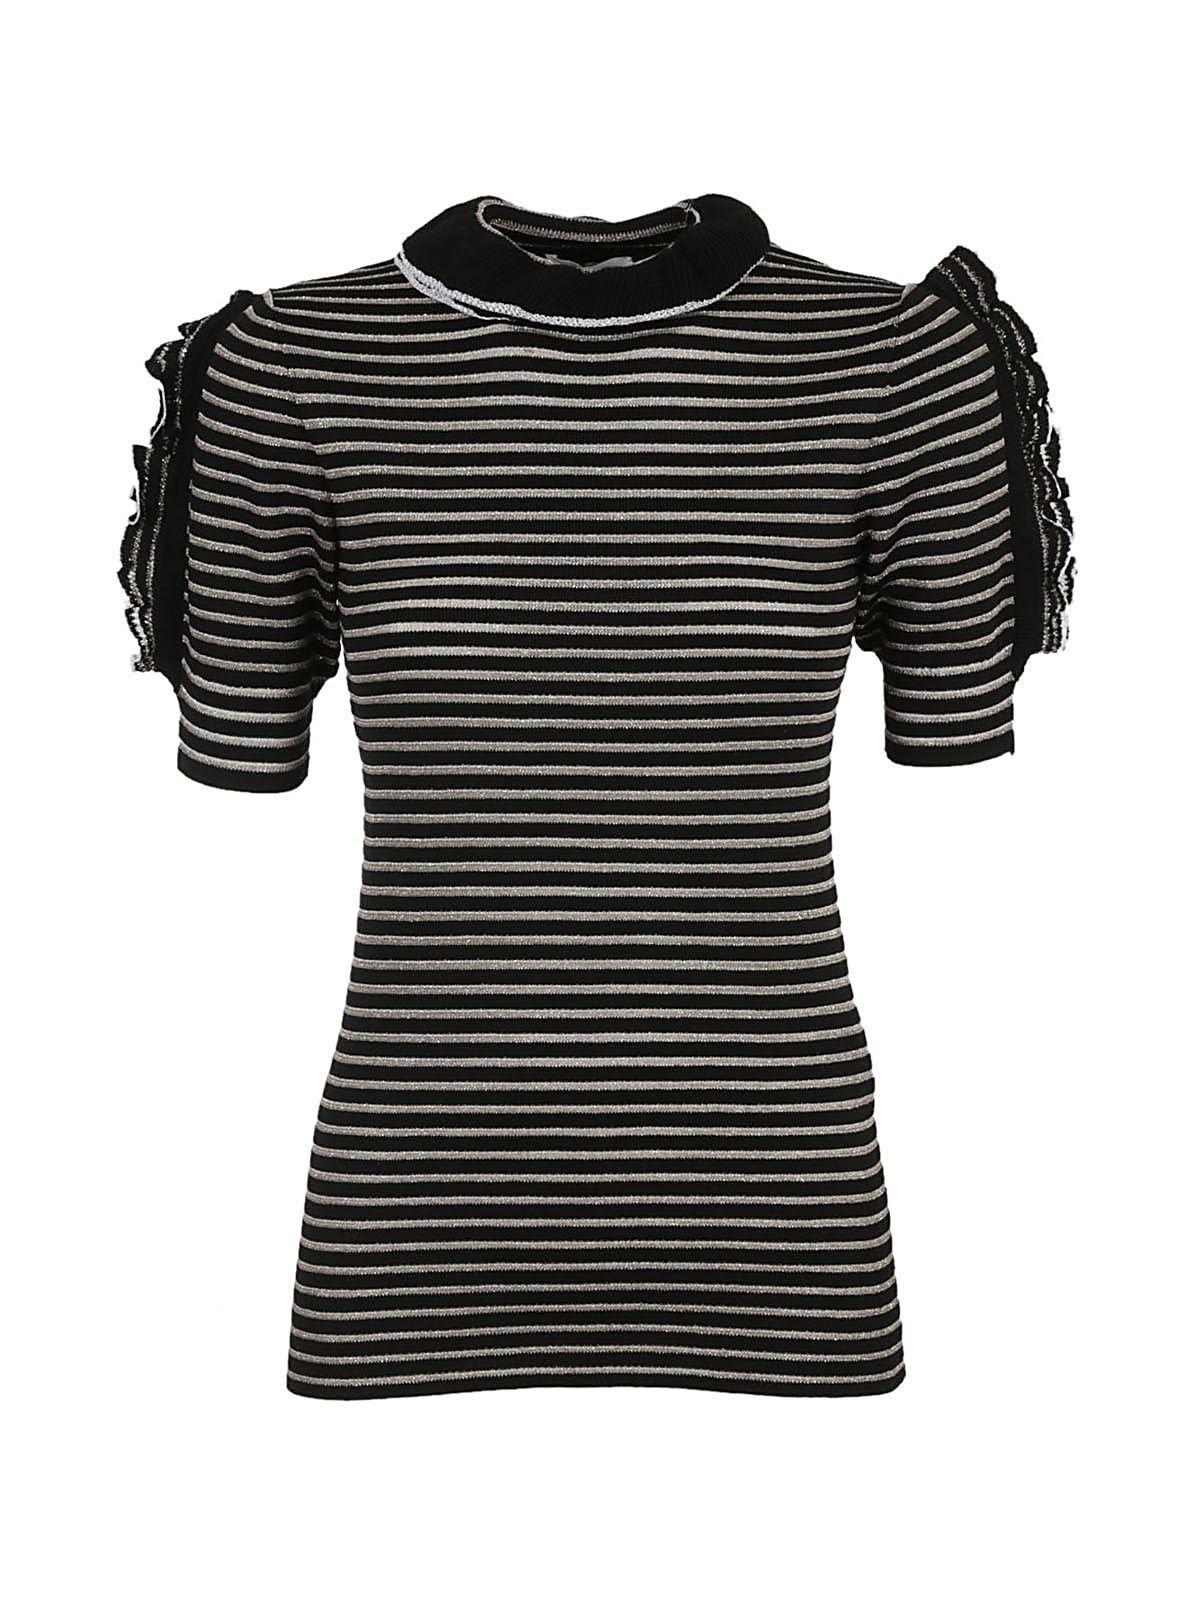 Sonia Rykiel Ruffle Stripped Pullover In Nero-oro